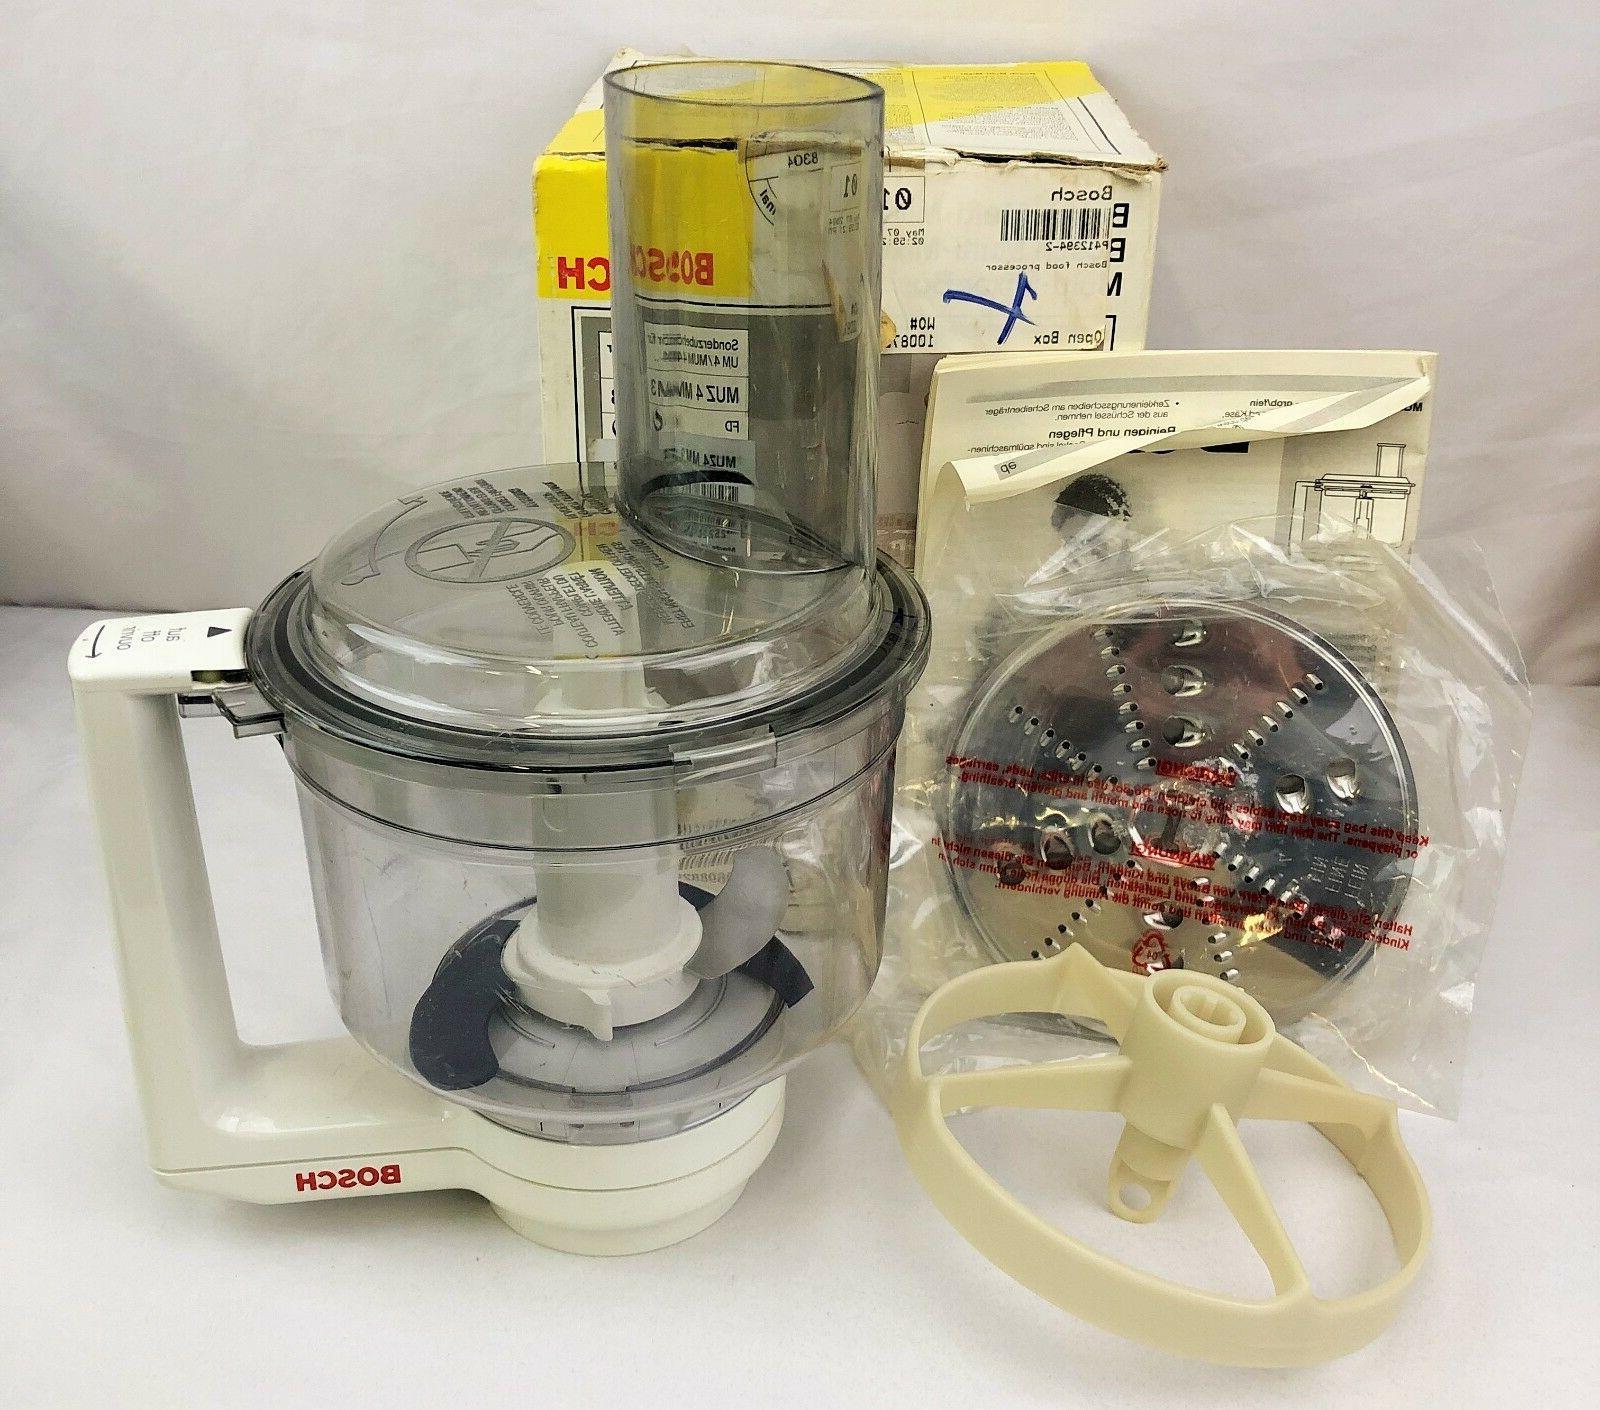 compact food processor muz4mm3 for mum 4